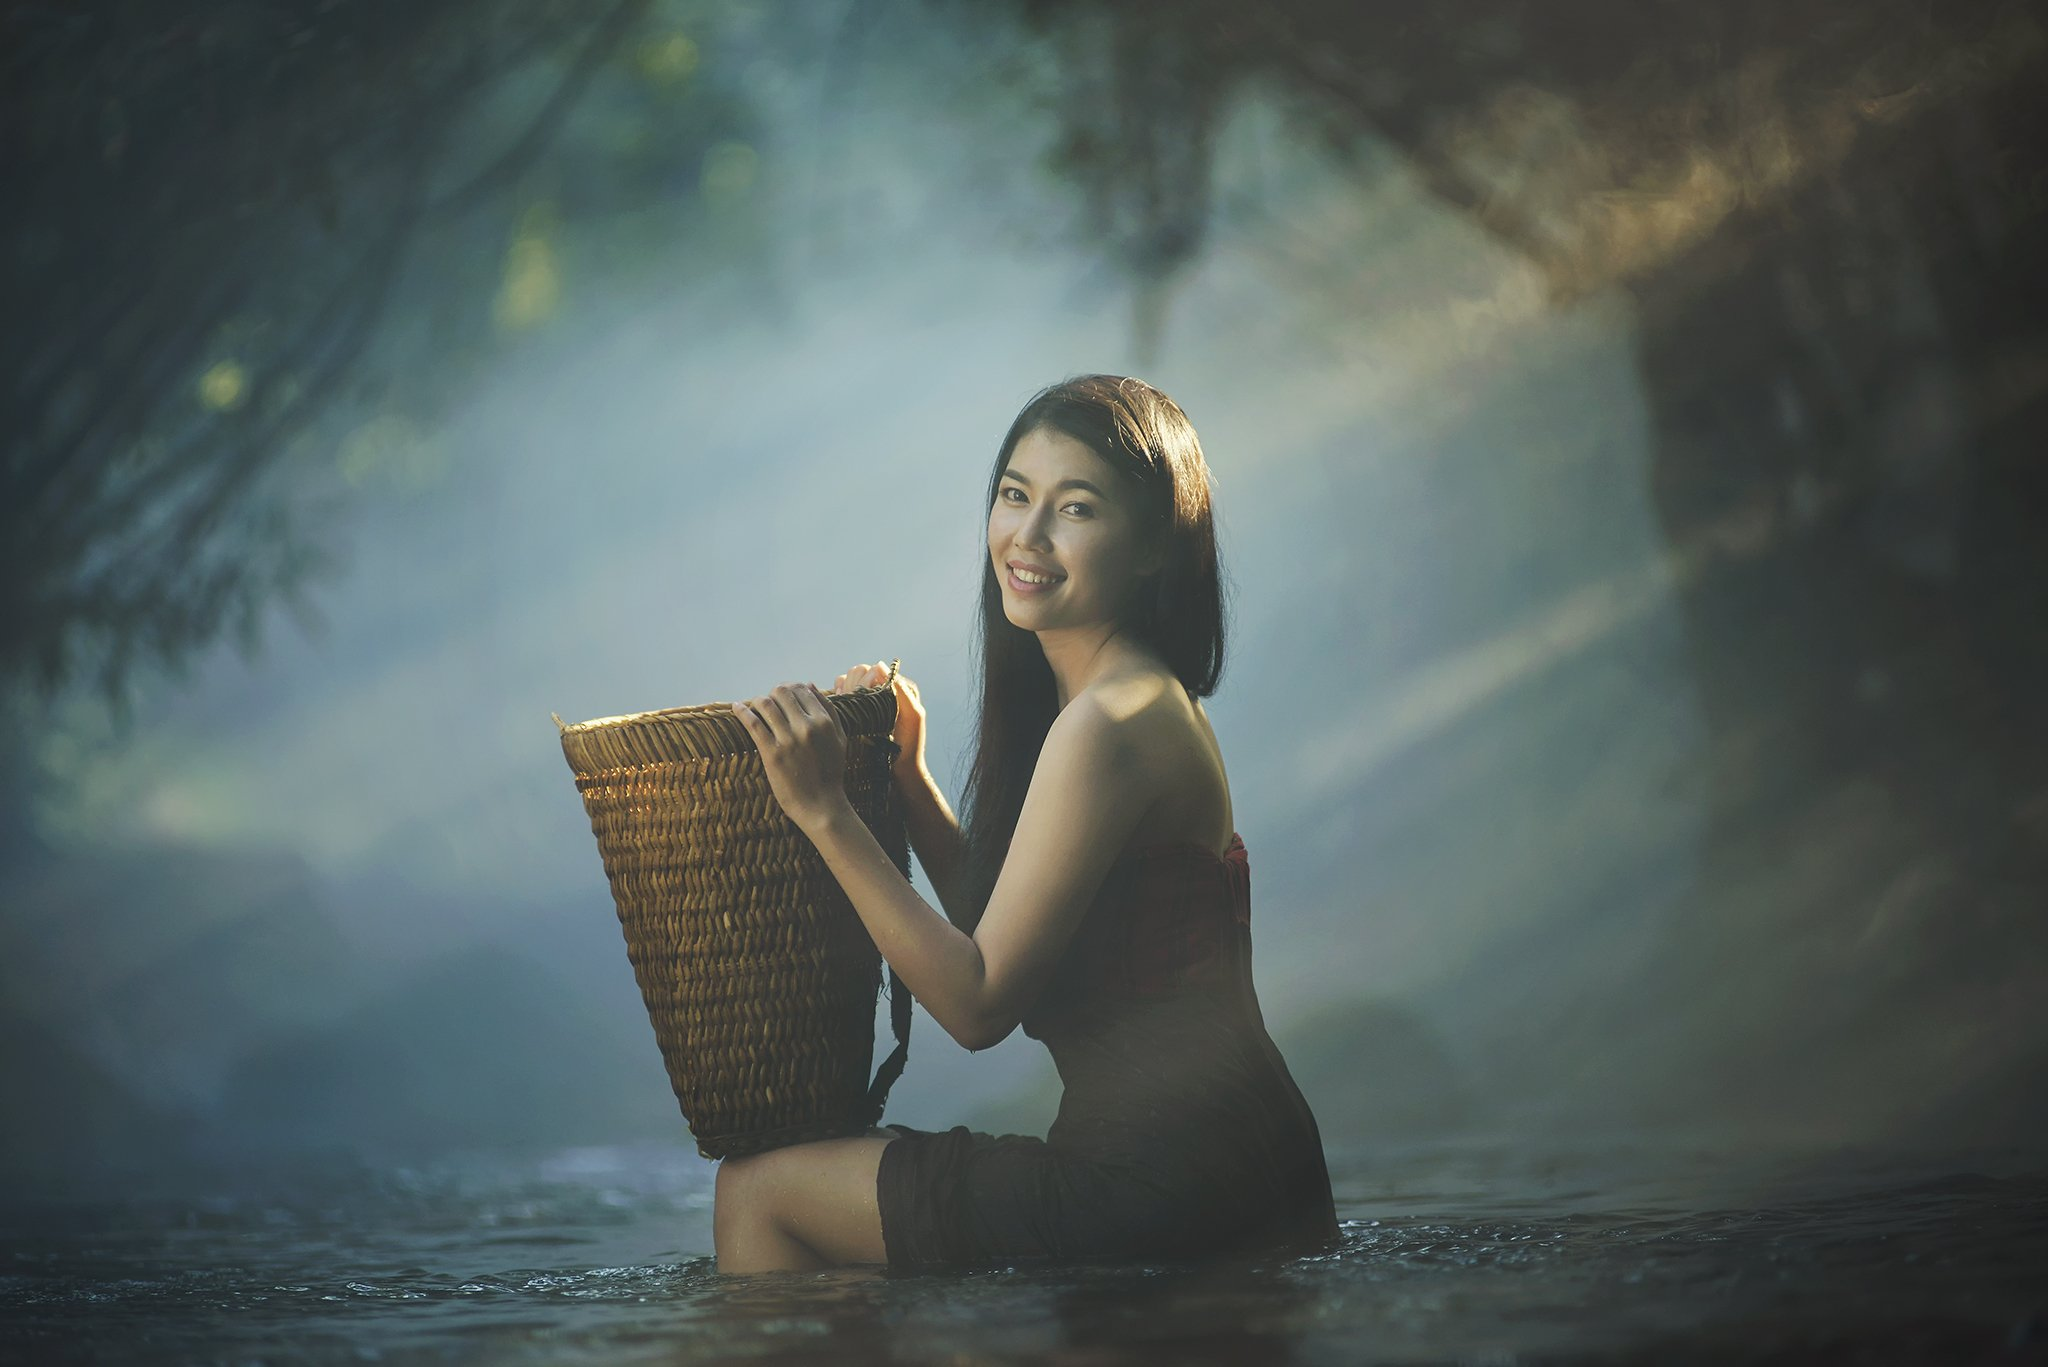 Asia, Asian, Beautiful, Girl, Holiday, Light, River, Thai, Thailand, Water, Waterfall, Woman, Saravut Whanset